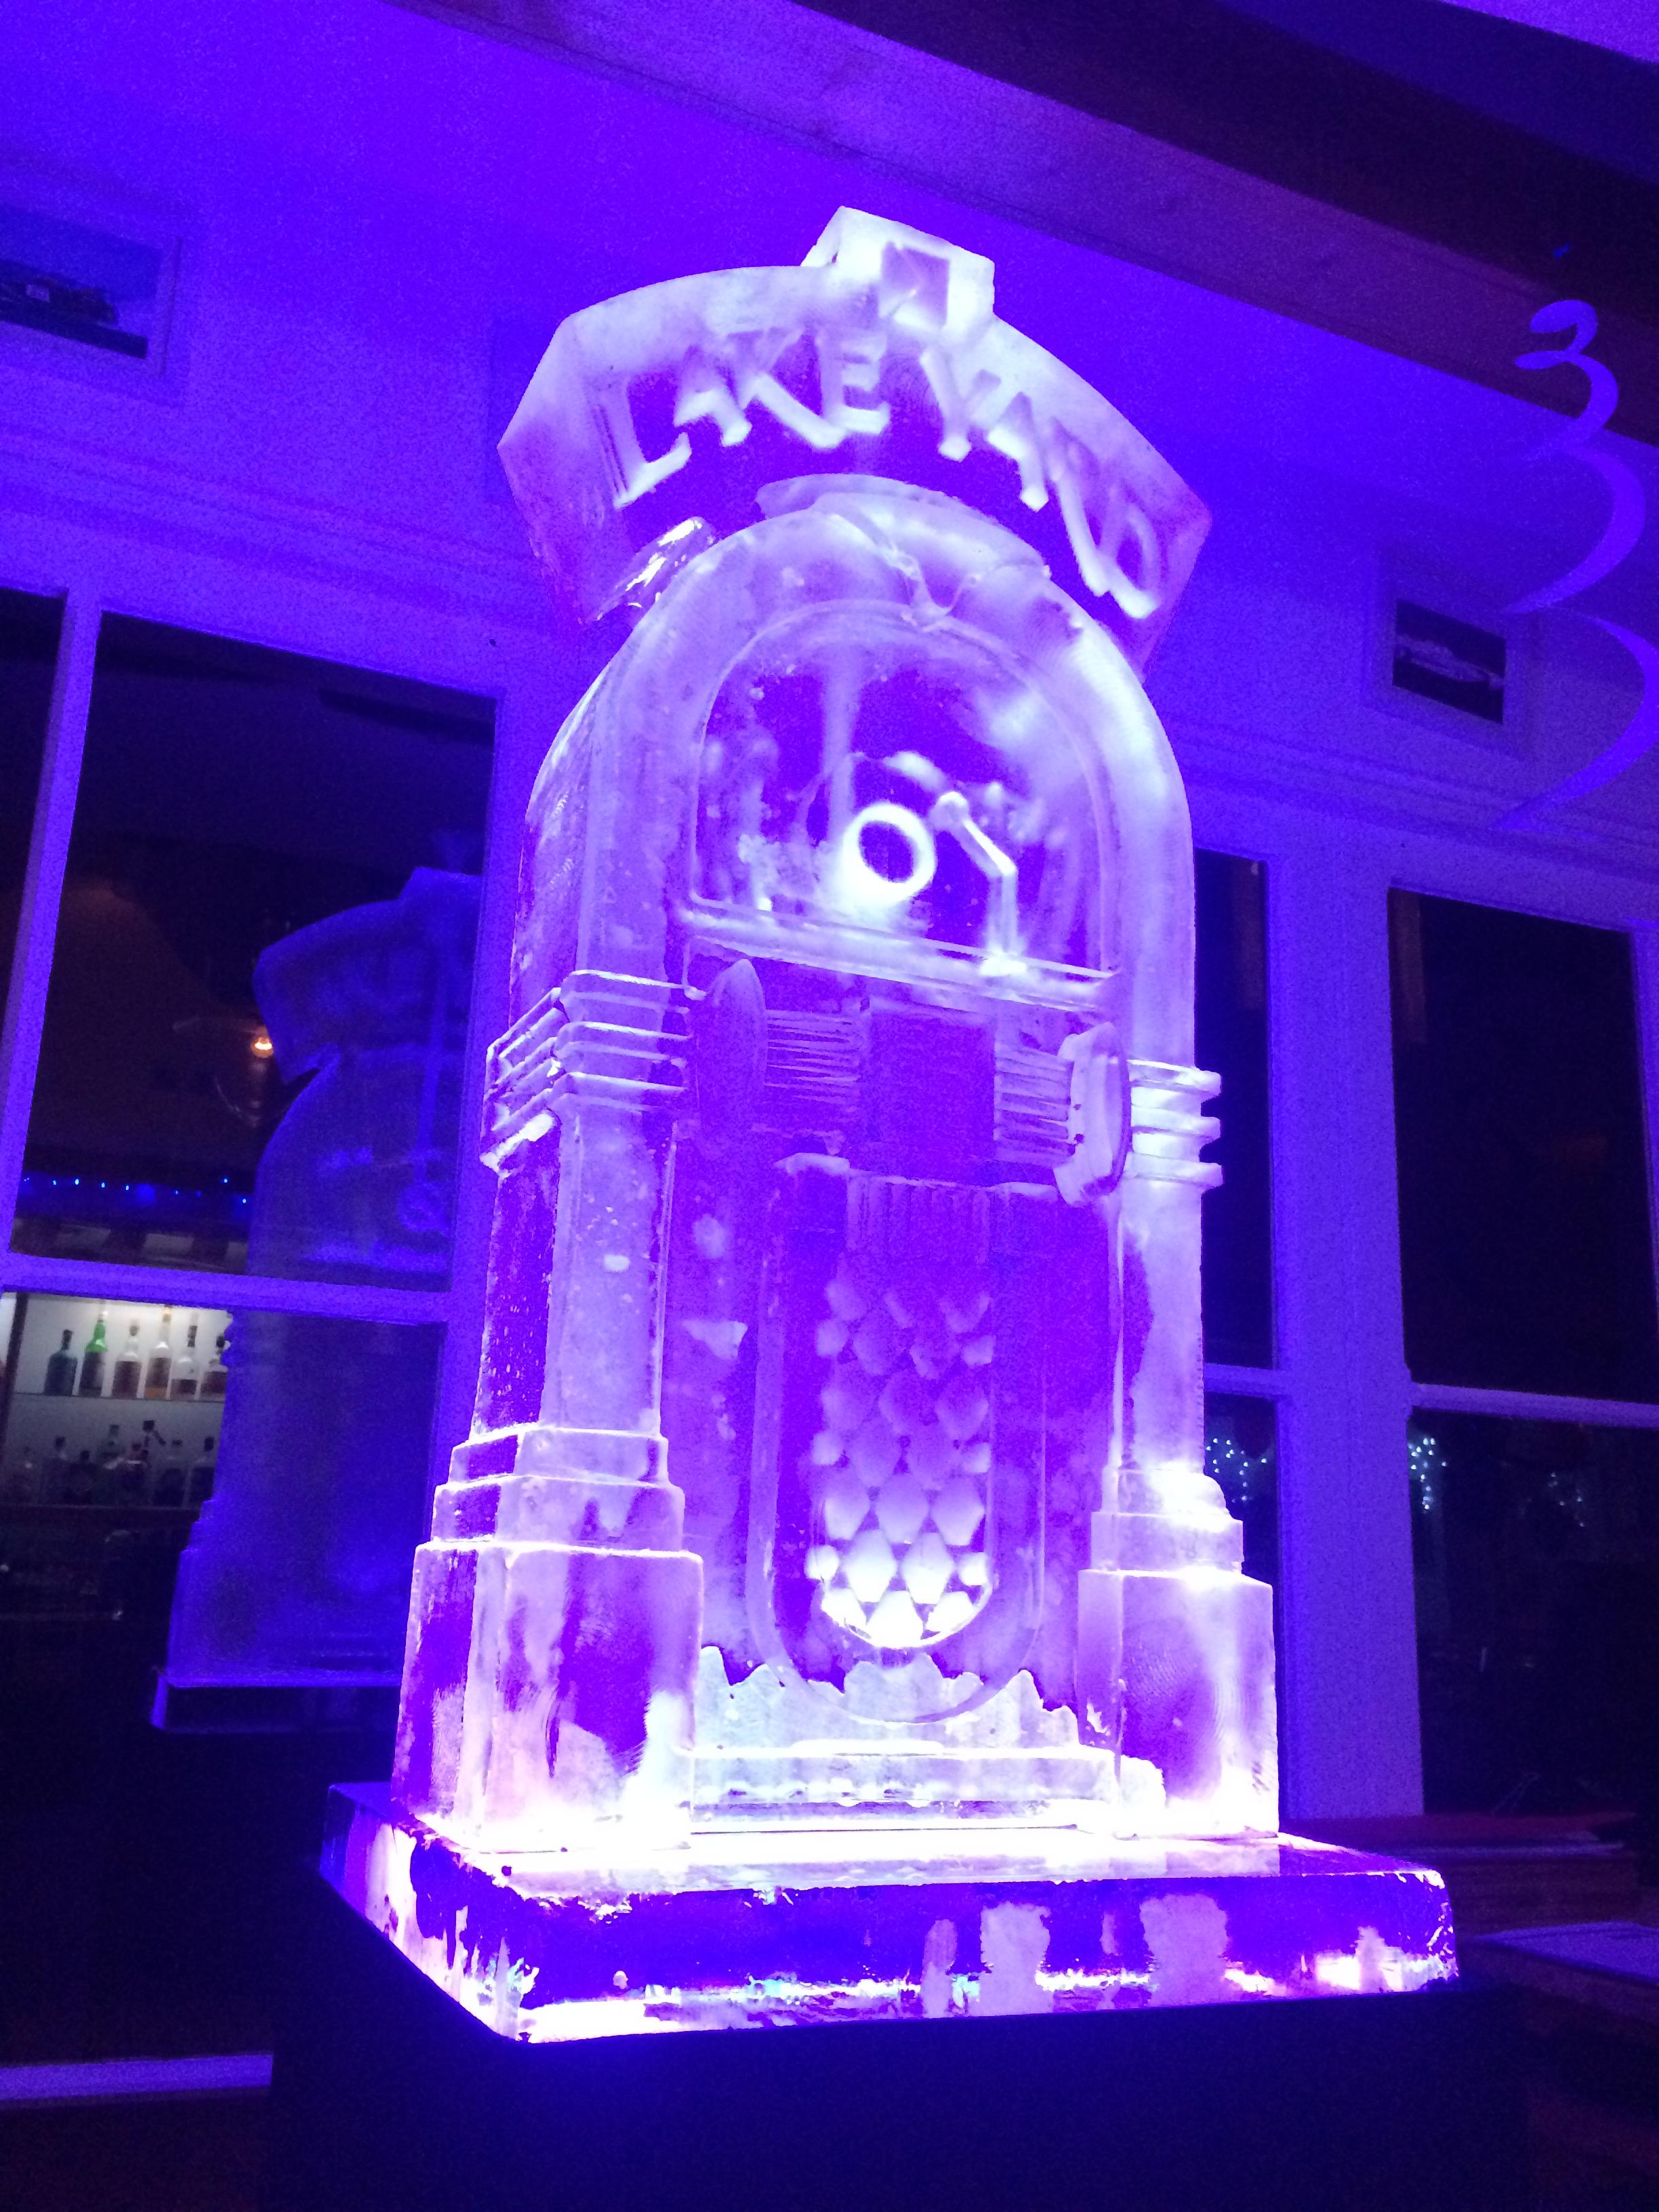 Juke Box Vodka Luge - New Years Eve Sculpture